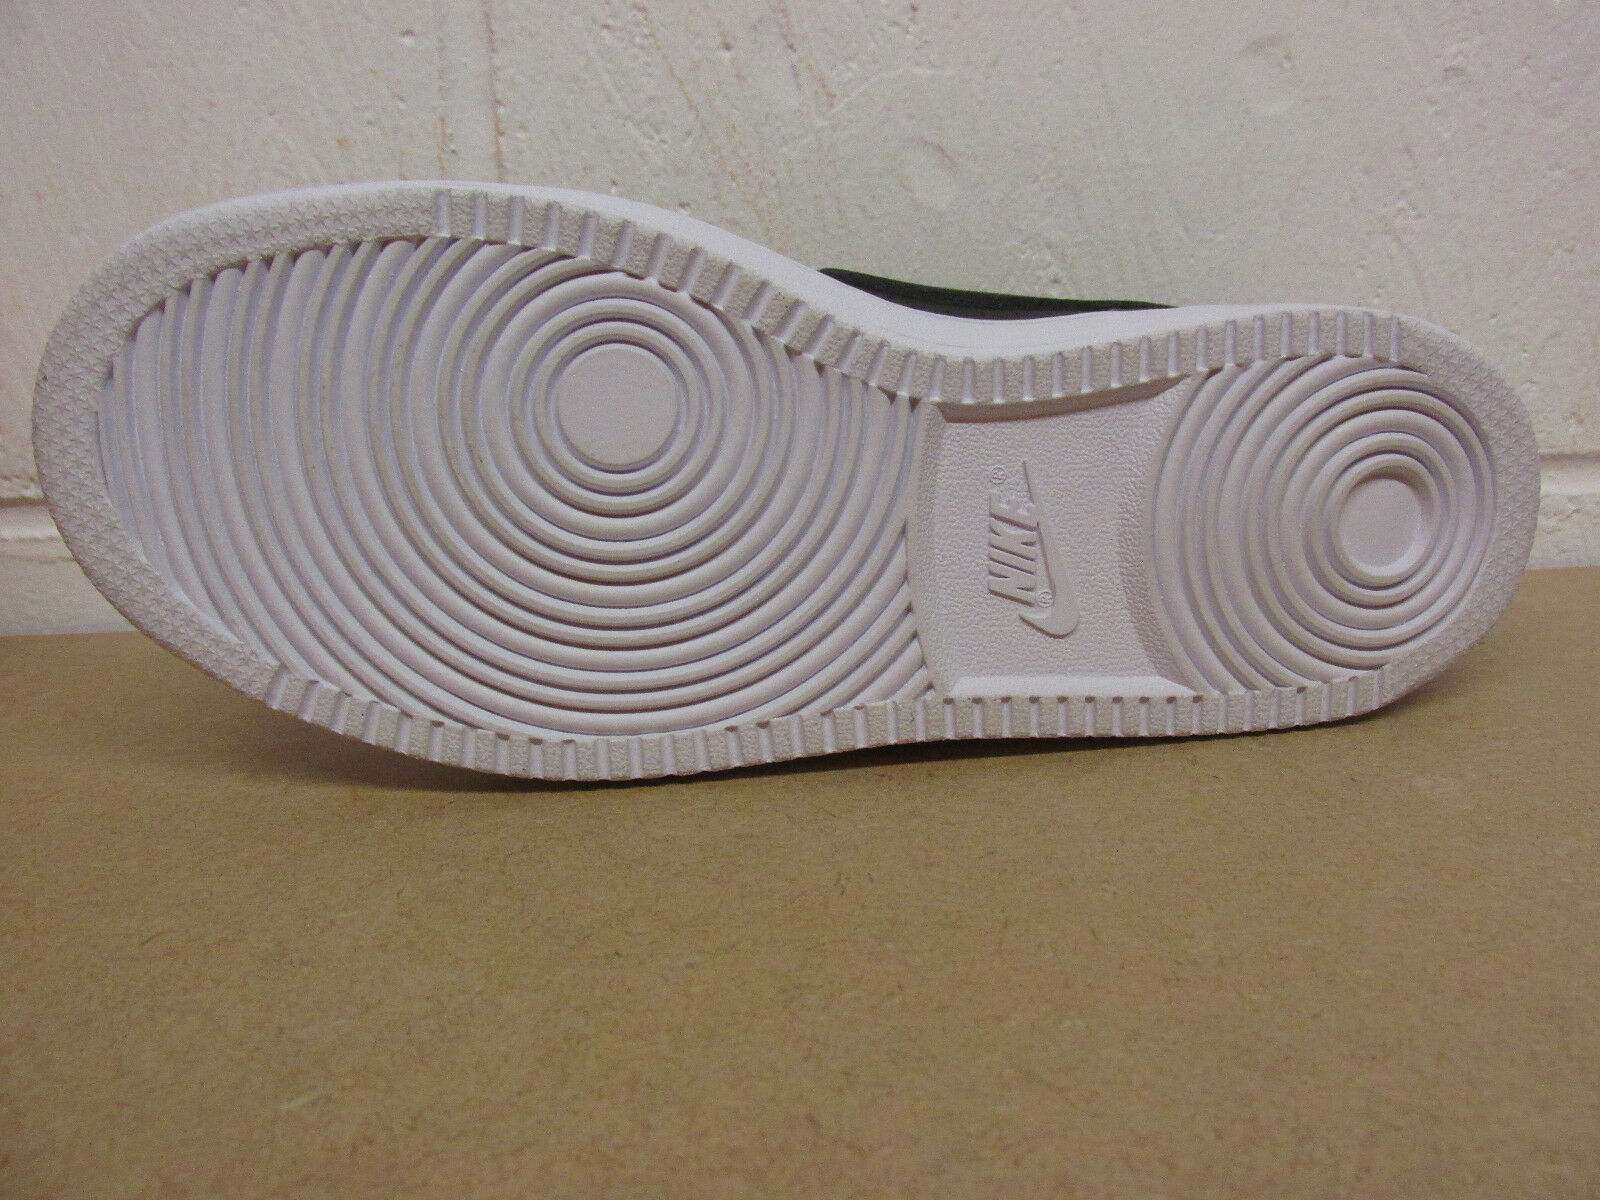 Nike Damen Son Of Force 006 Hi Top Turnschuhe 616302 006 Force Turnschuhe 0d07ca